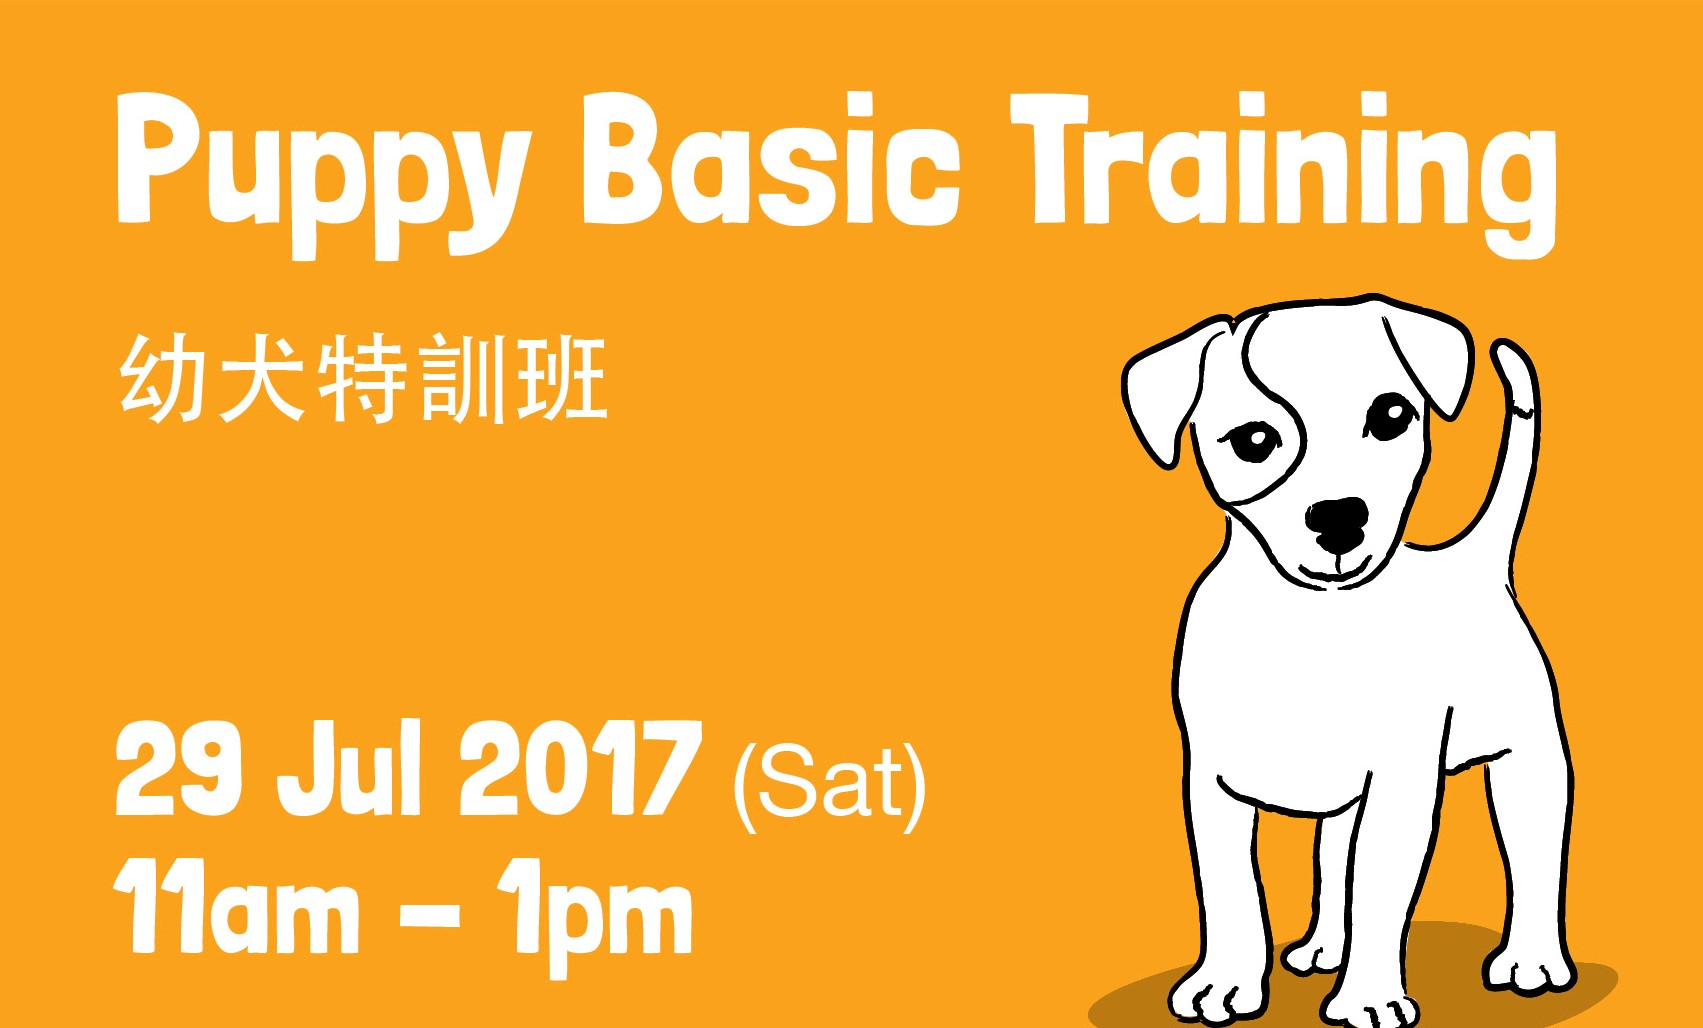 Puppy Basic Training